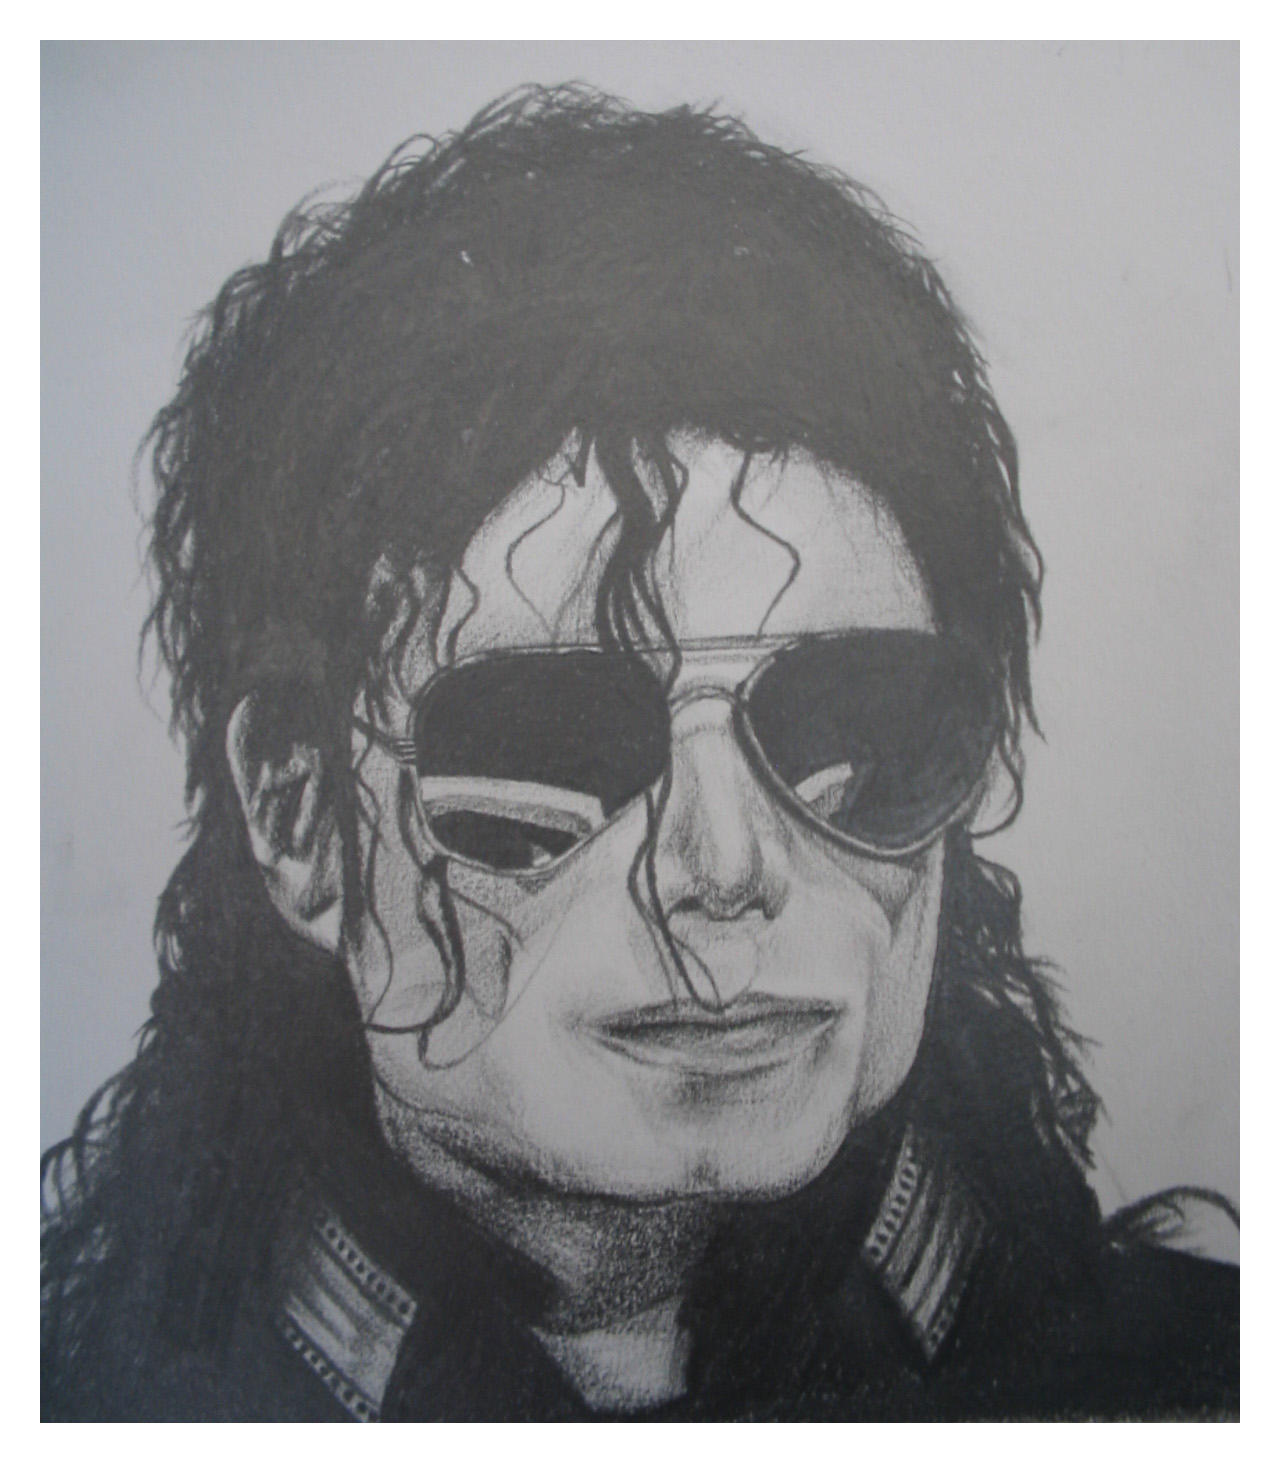 http://fc03.deviantart.com/fs7/i/2005/199/5/2/Michael_Jackson_by_kenkennykenken.jpg